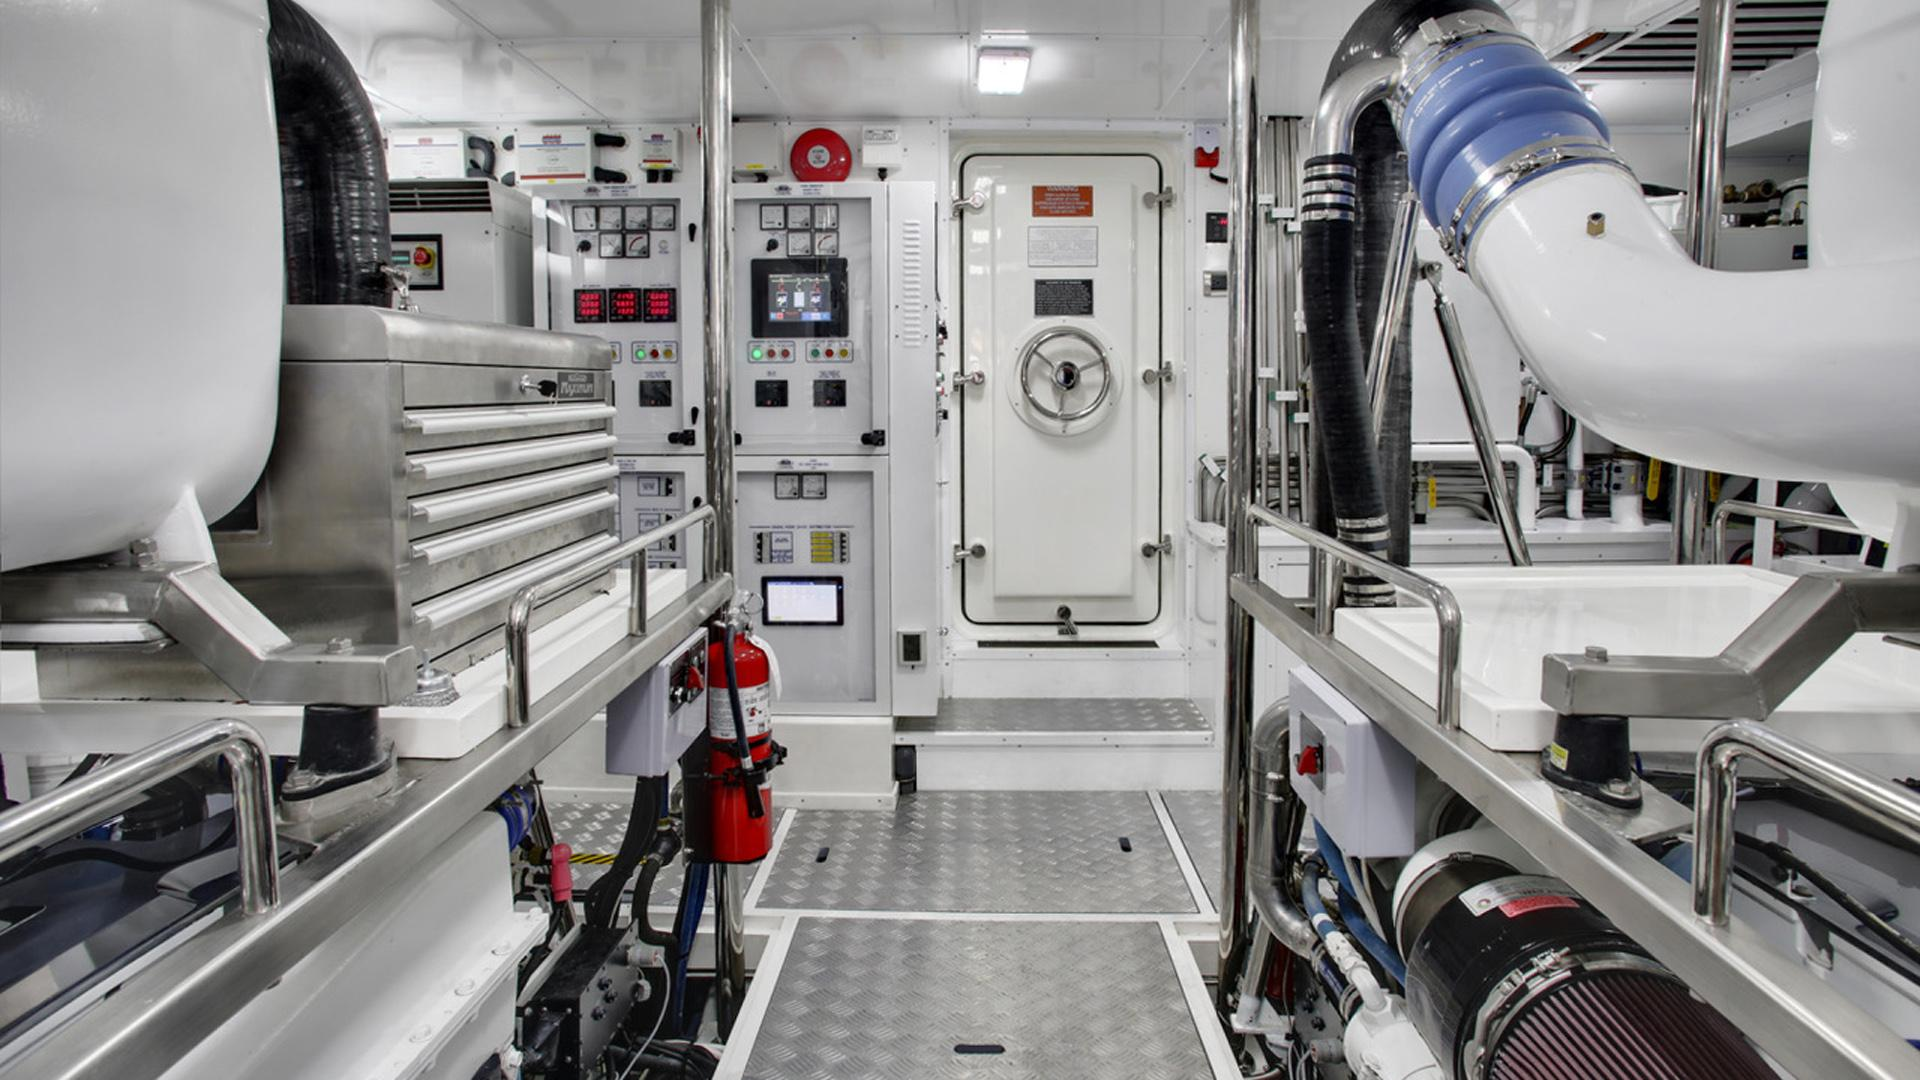 watta ryde motoryacht jet tern marine selene 92 2016 28m engine room